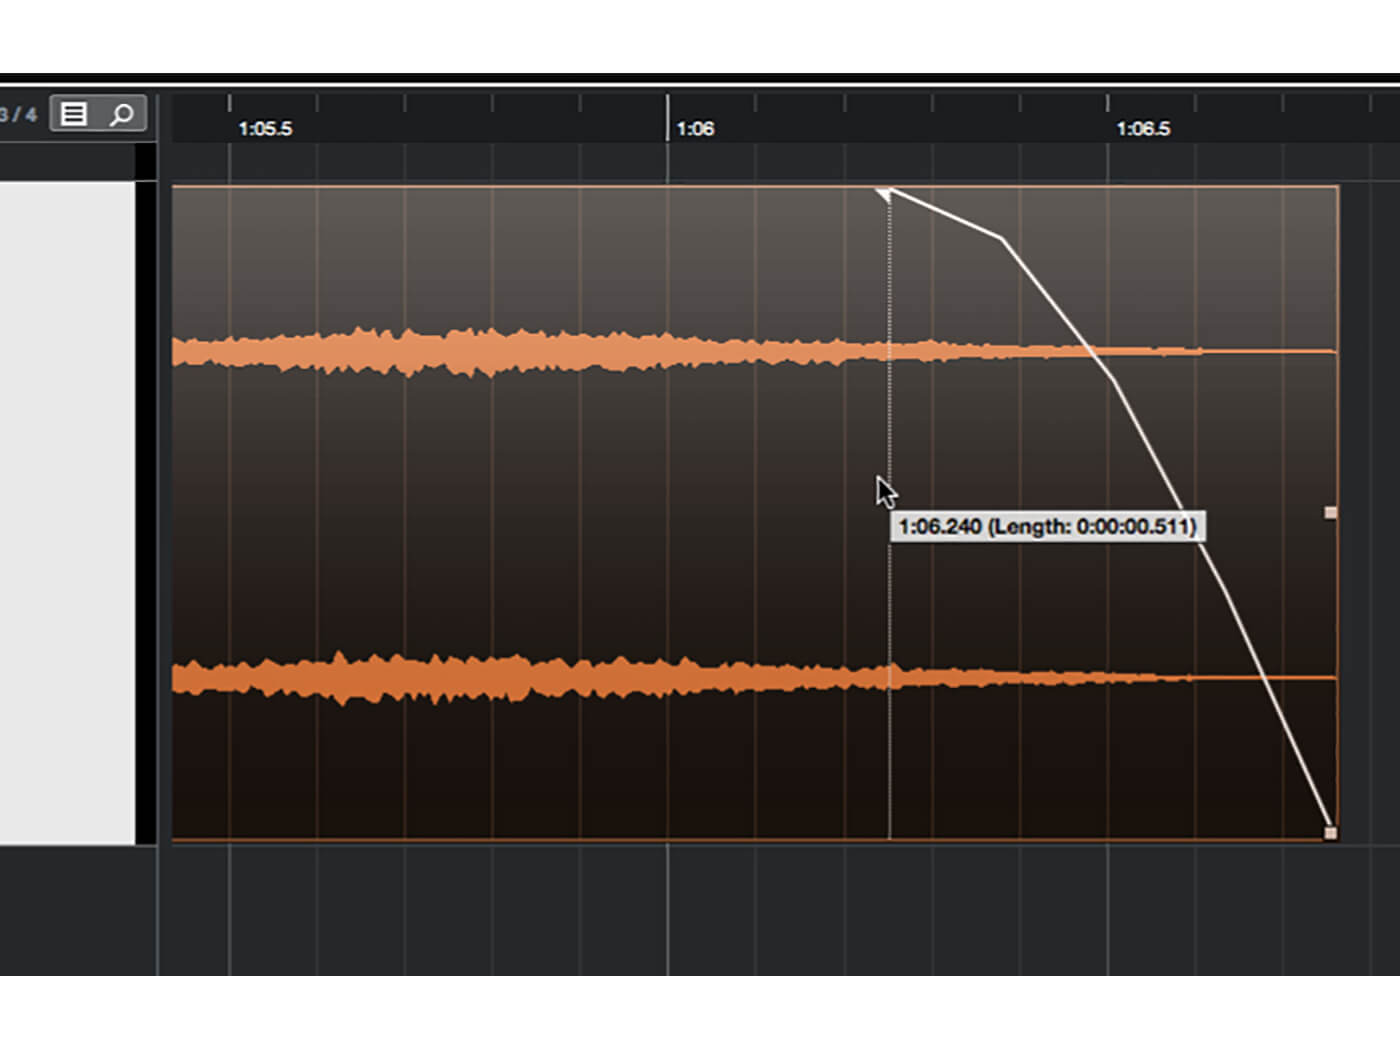 Tutorial: Mastering using Cubase 10